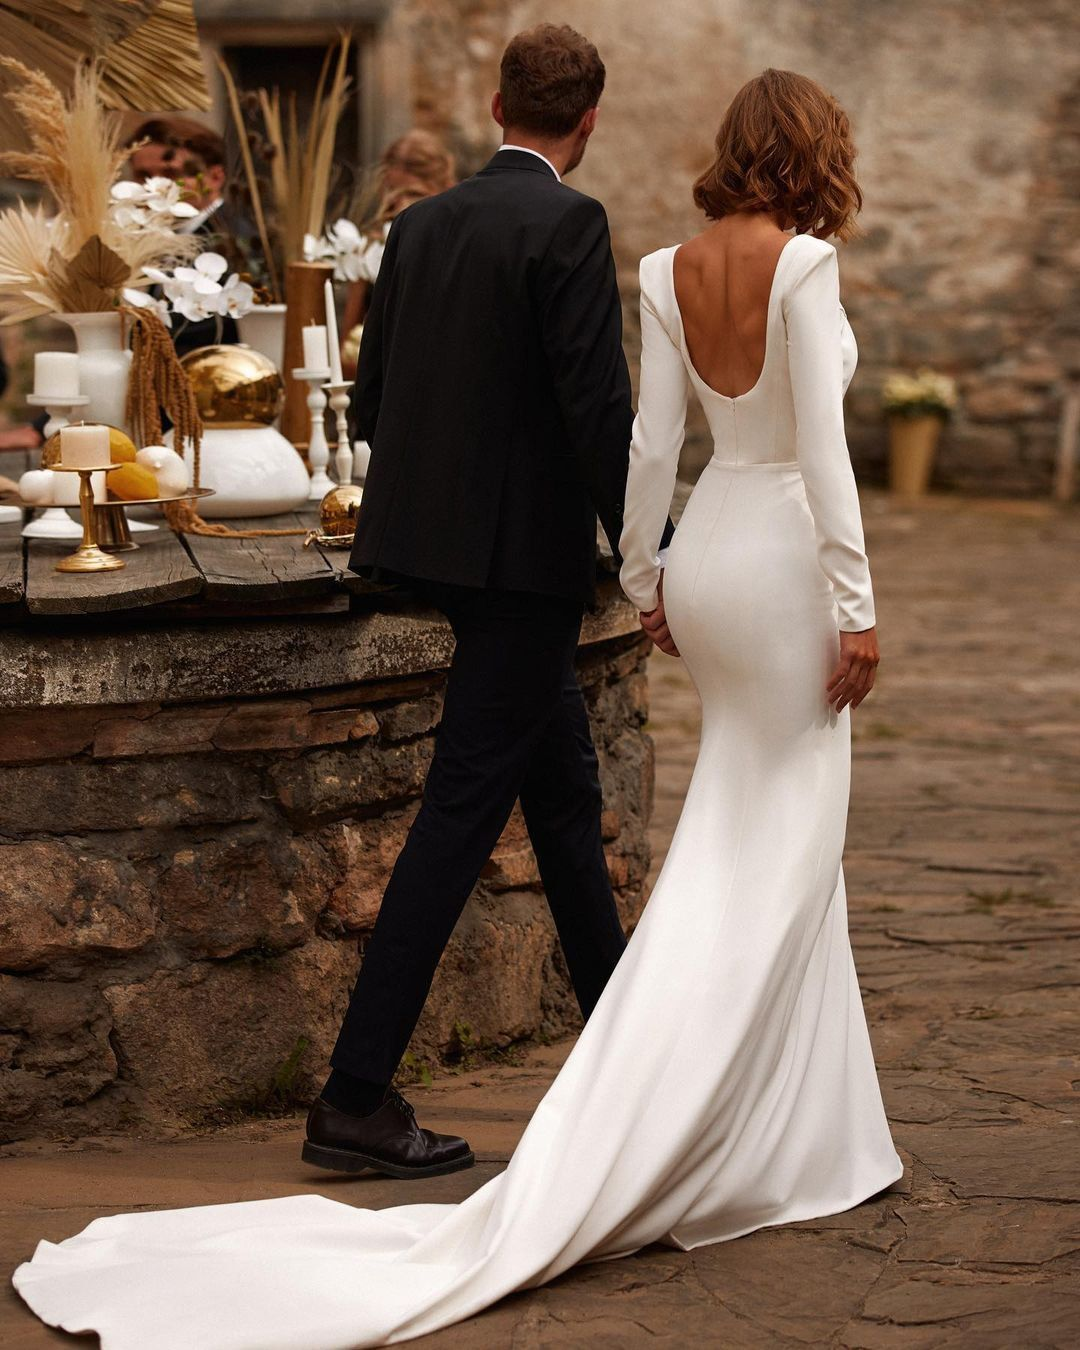 30 Simple Wedding Dresses For Elegant Brides Elegant Wedding Dress Winter Wedding Dress Wedding Dress Long Sleeve [ 1350 x 1080 Pixel ]